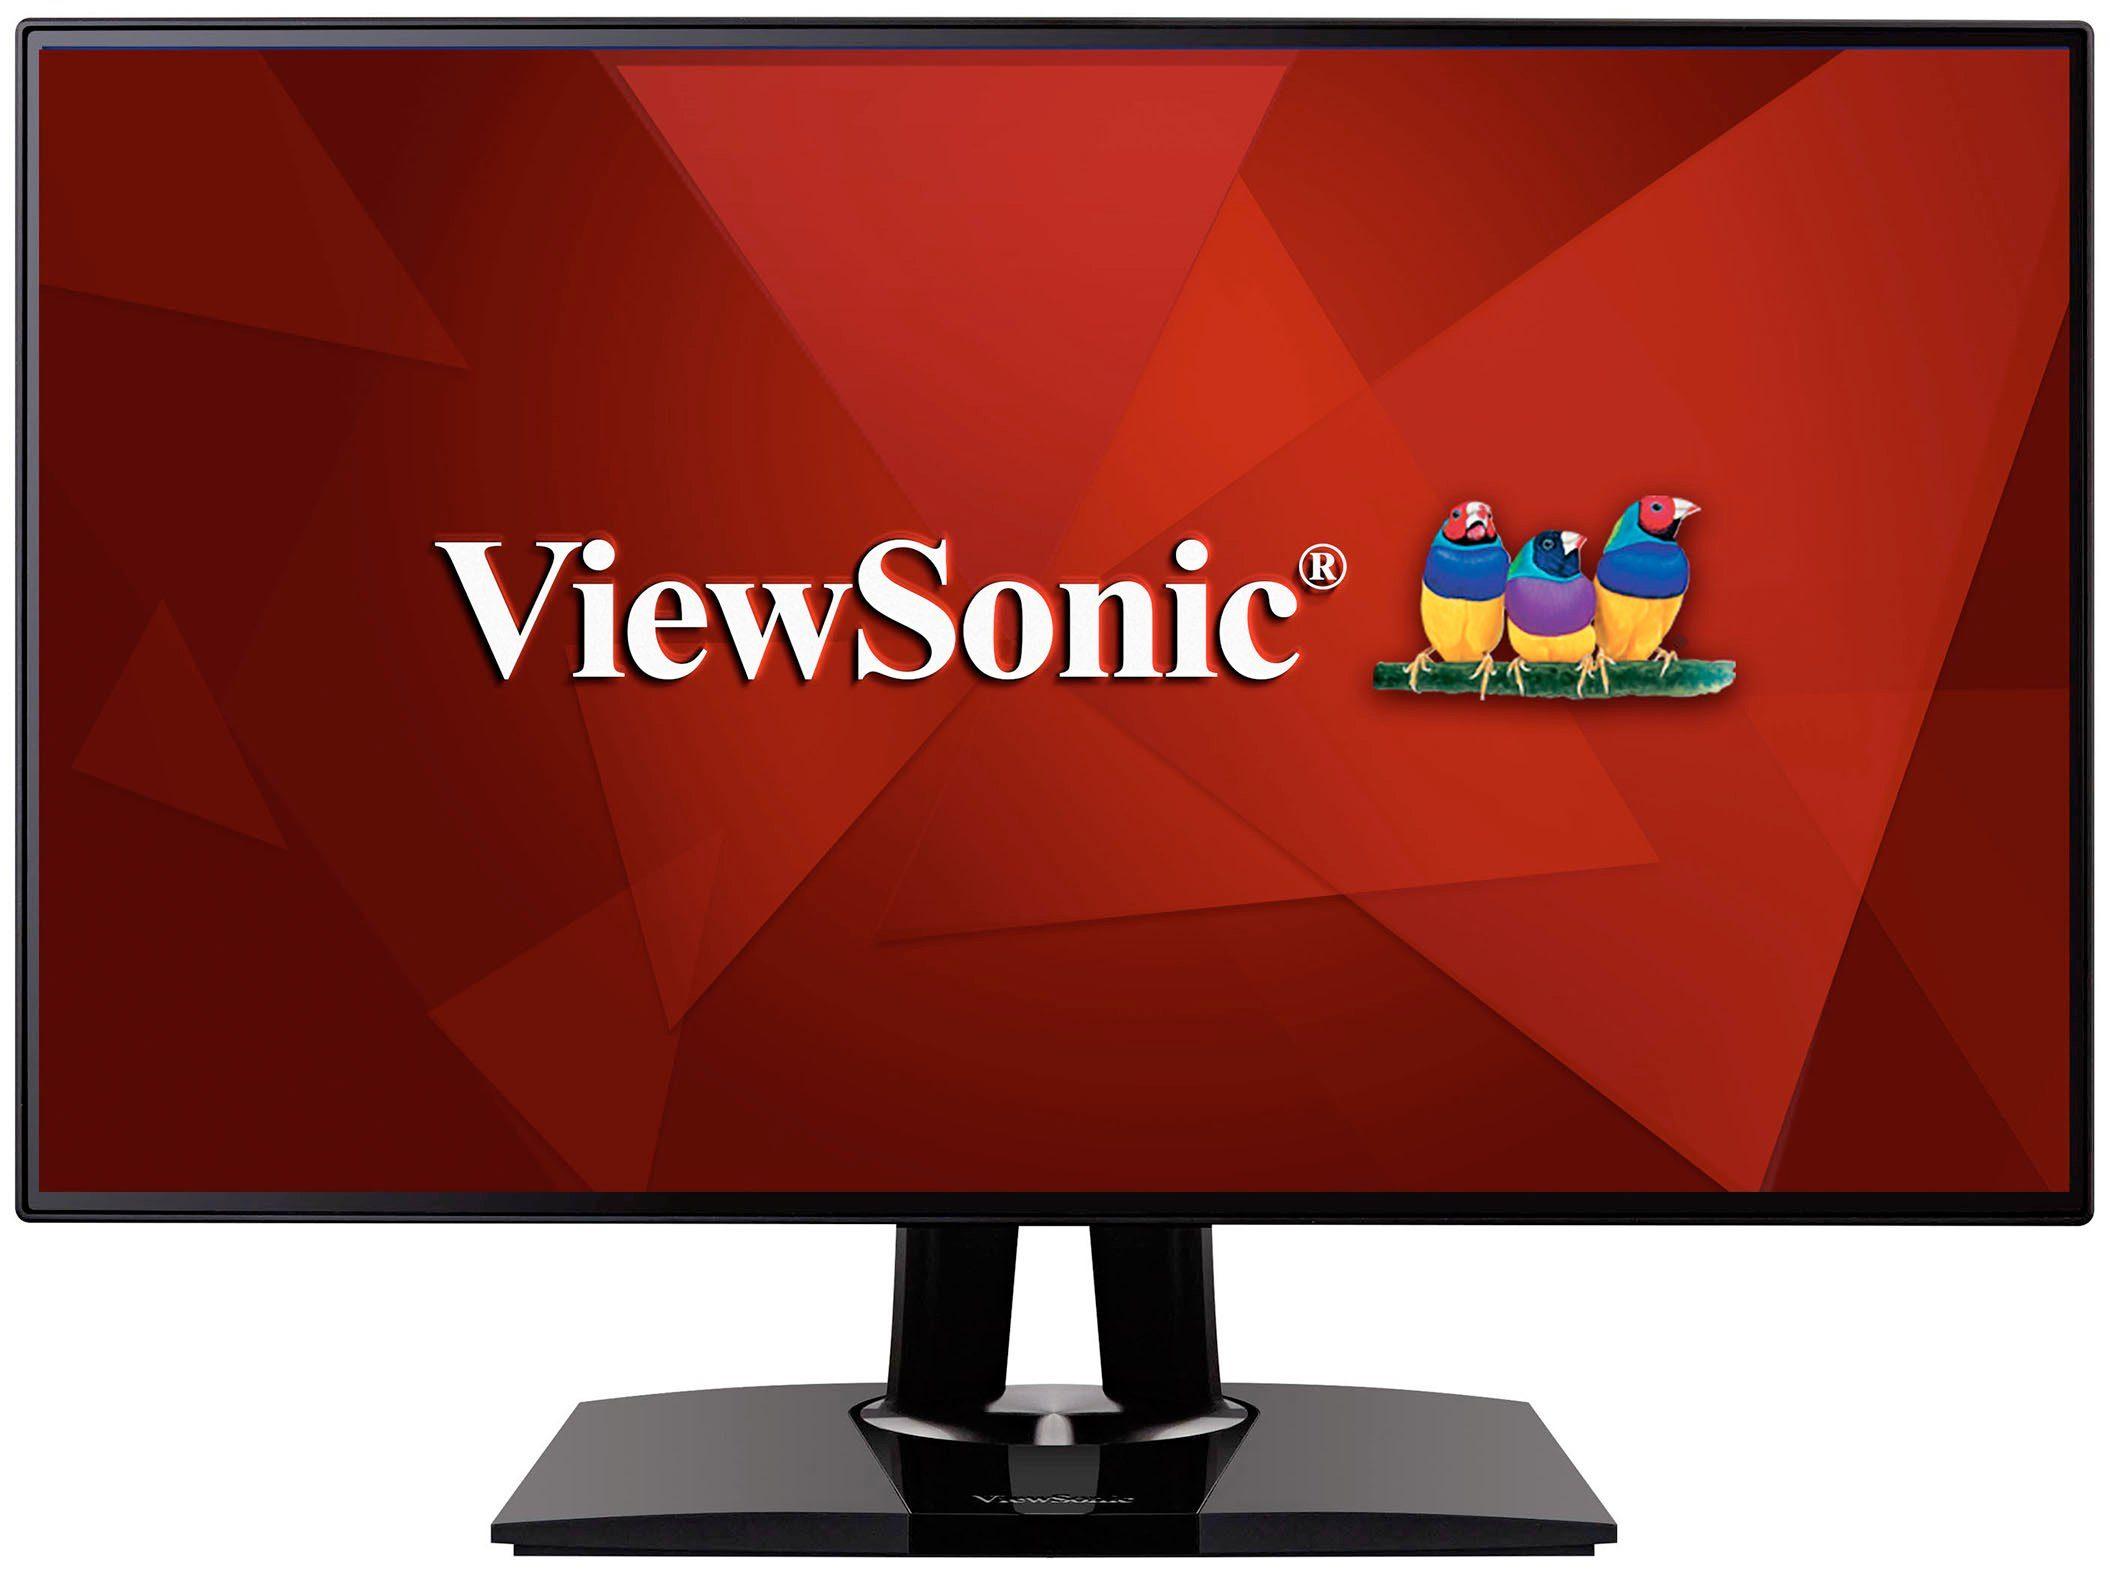 ViewSonic WQHD Fotografen Monitor (27 Zoll) mit kalibrierbarem IPS-Panel »VP2768«